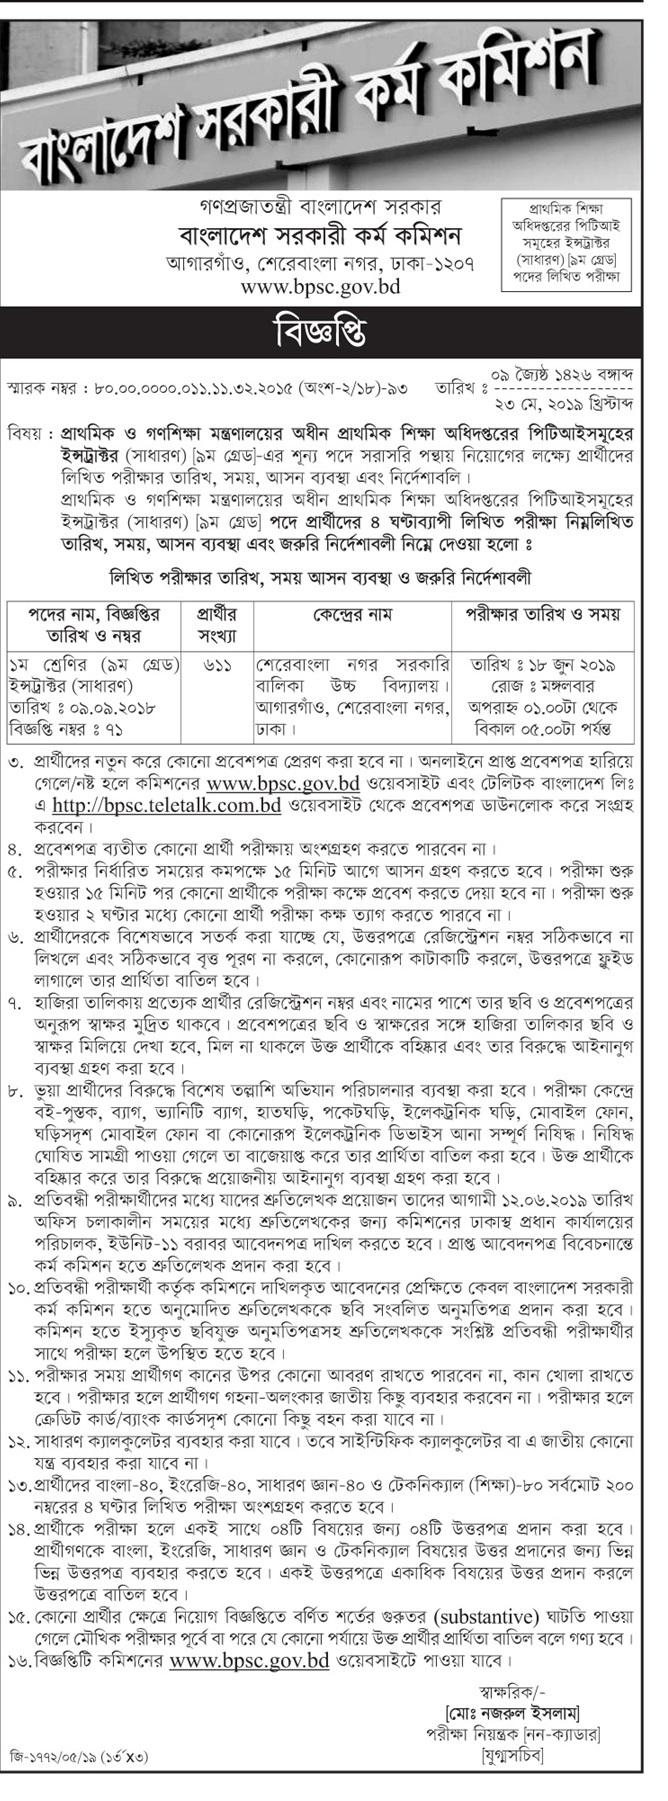 Bangladesh Public Service Commission(BPSC) Job Exam Schedule Notice 2019